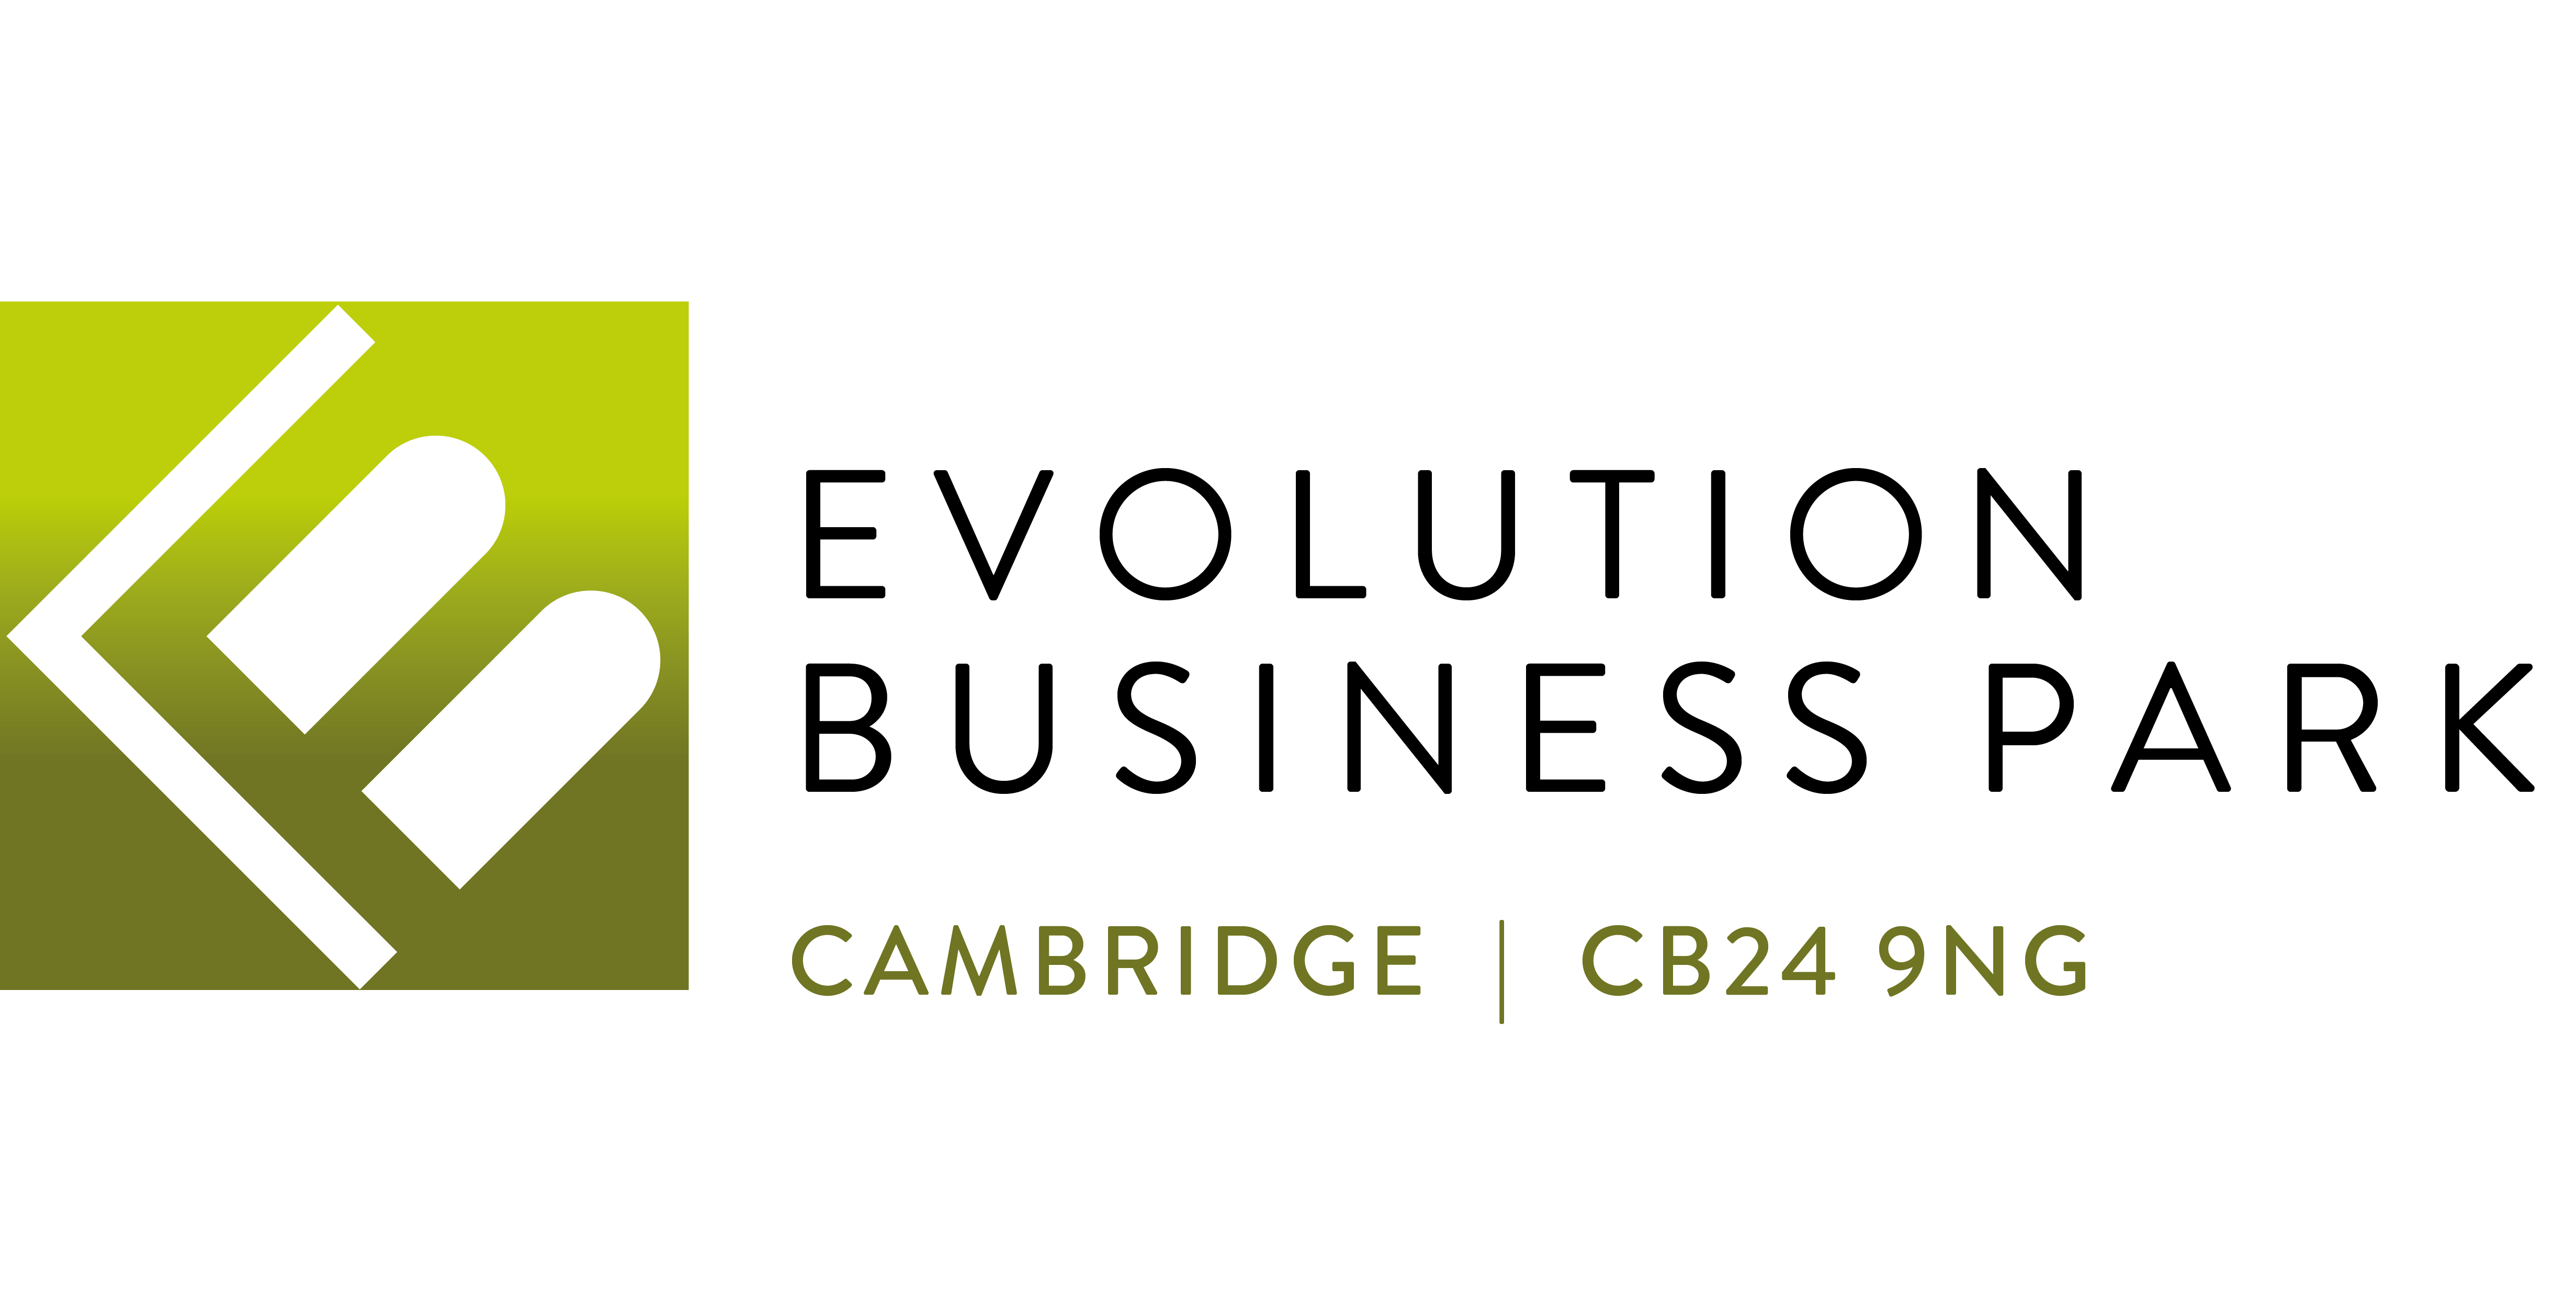 Evolution Business Park